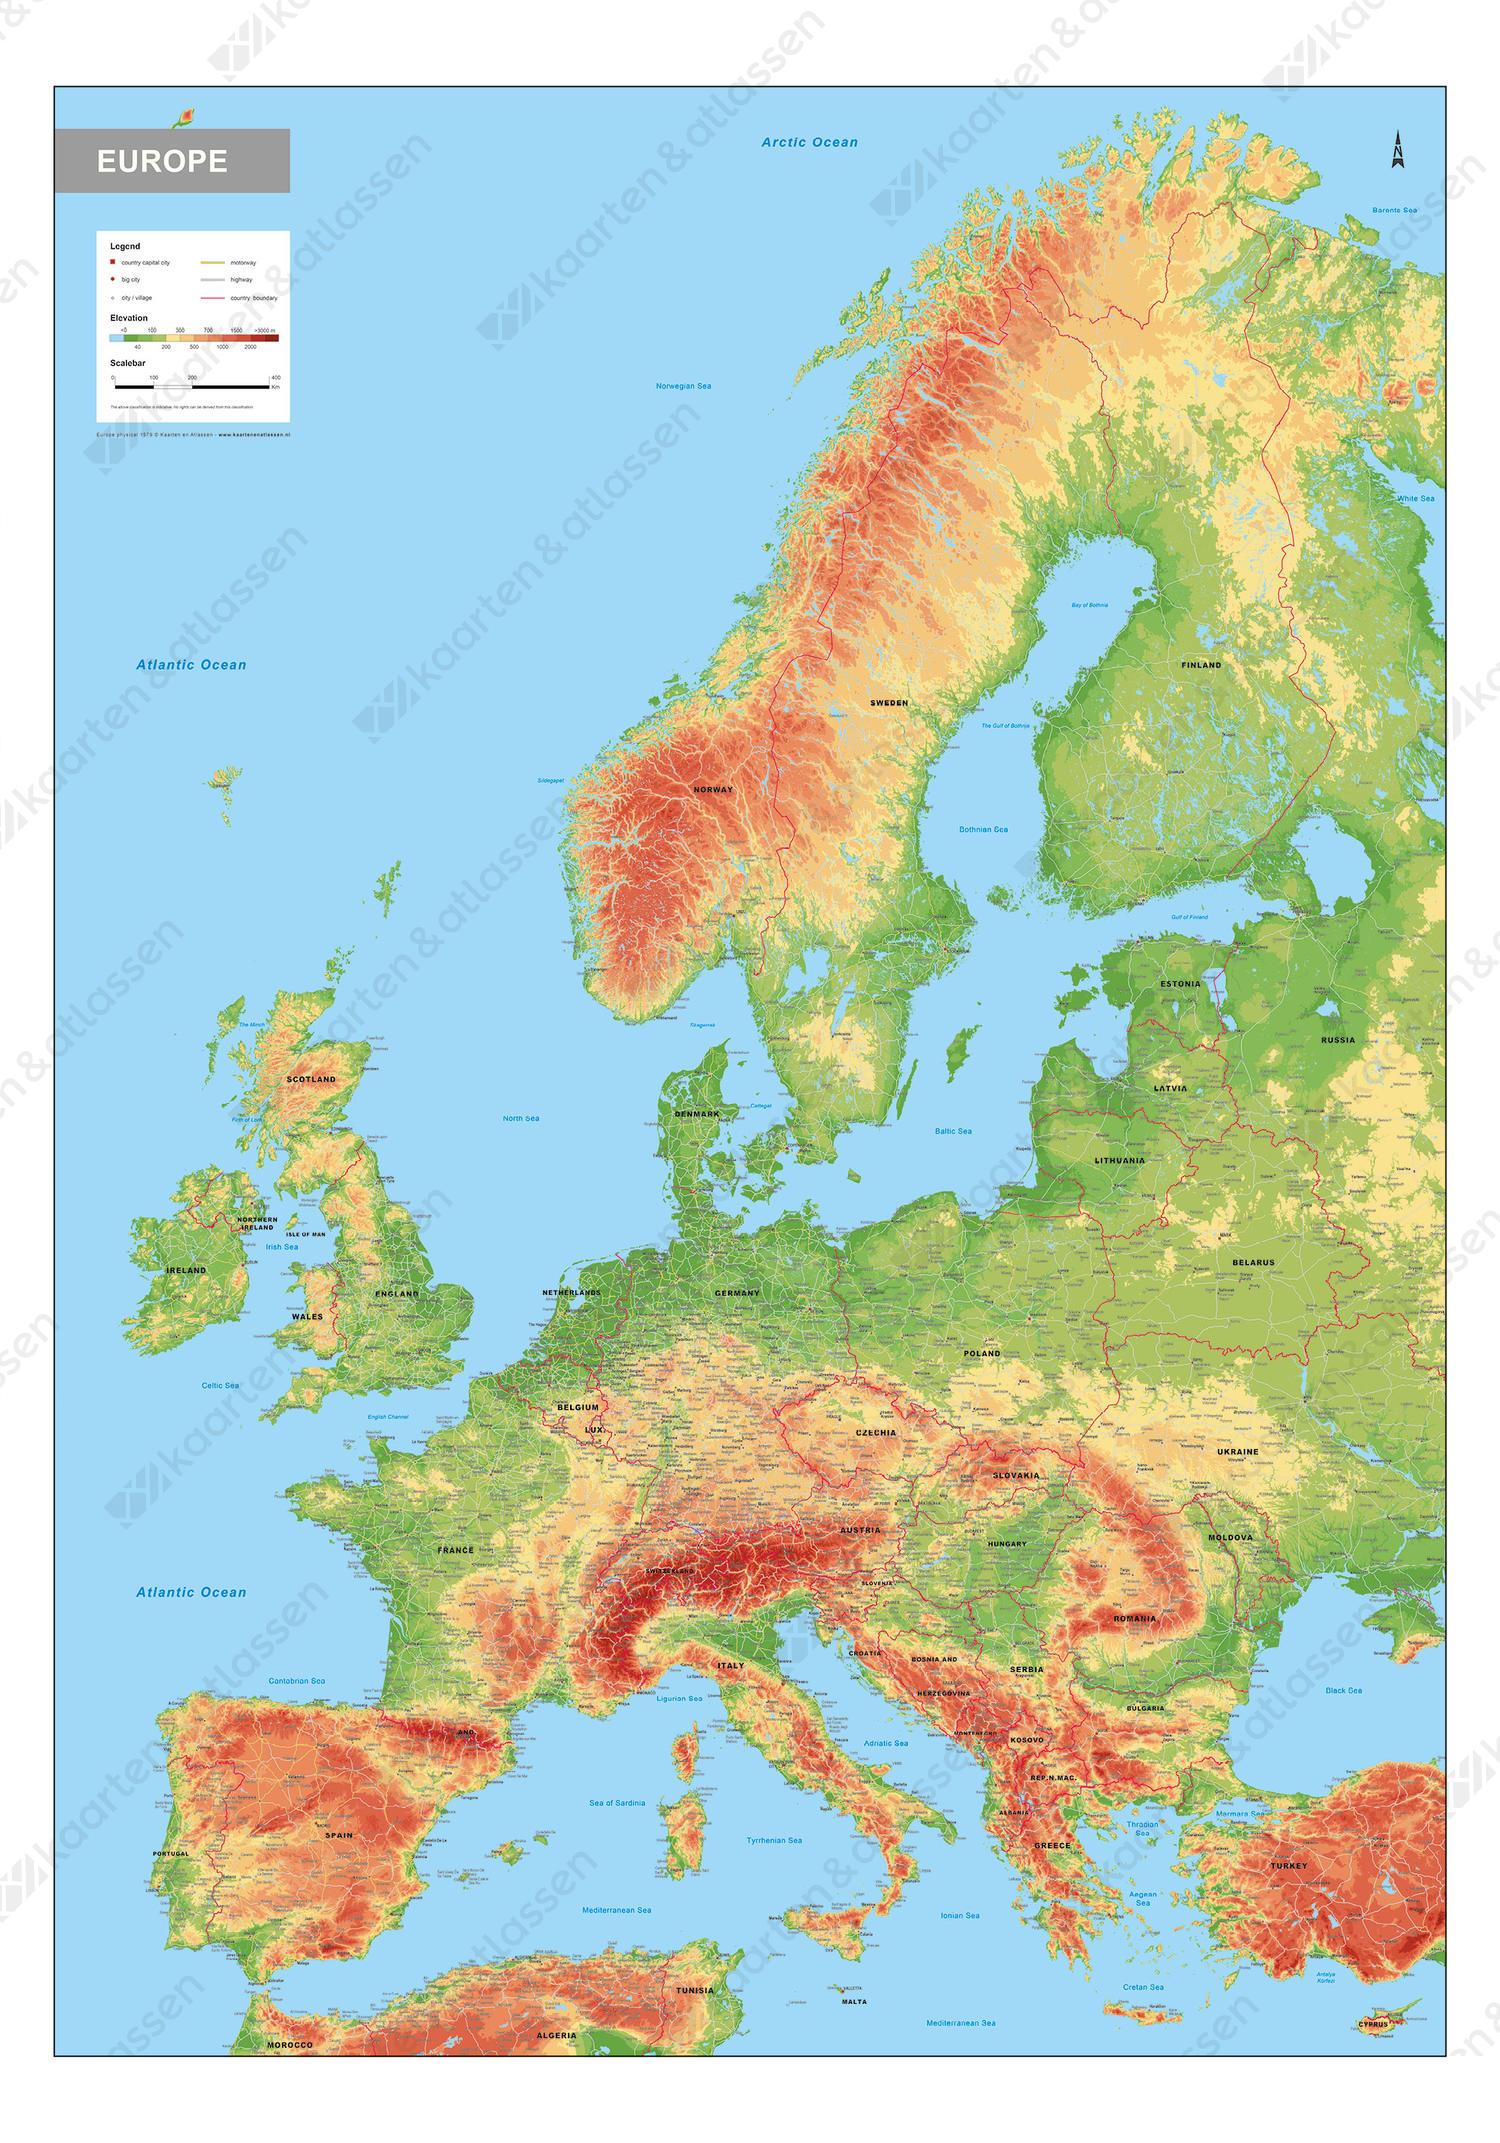 Europa Kaart Natuurkundig